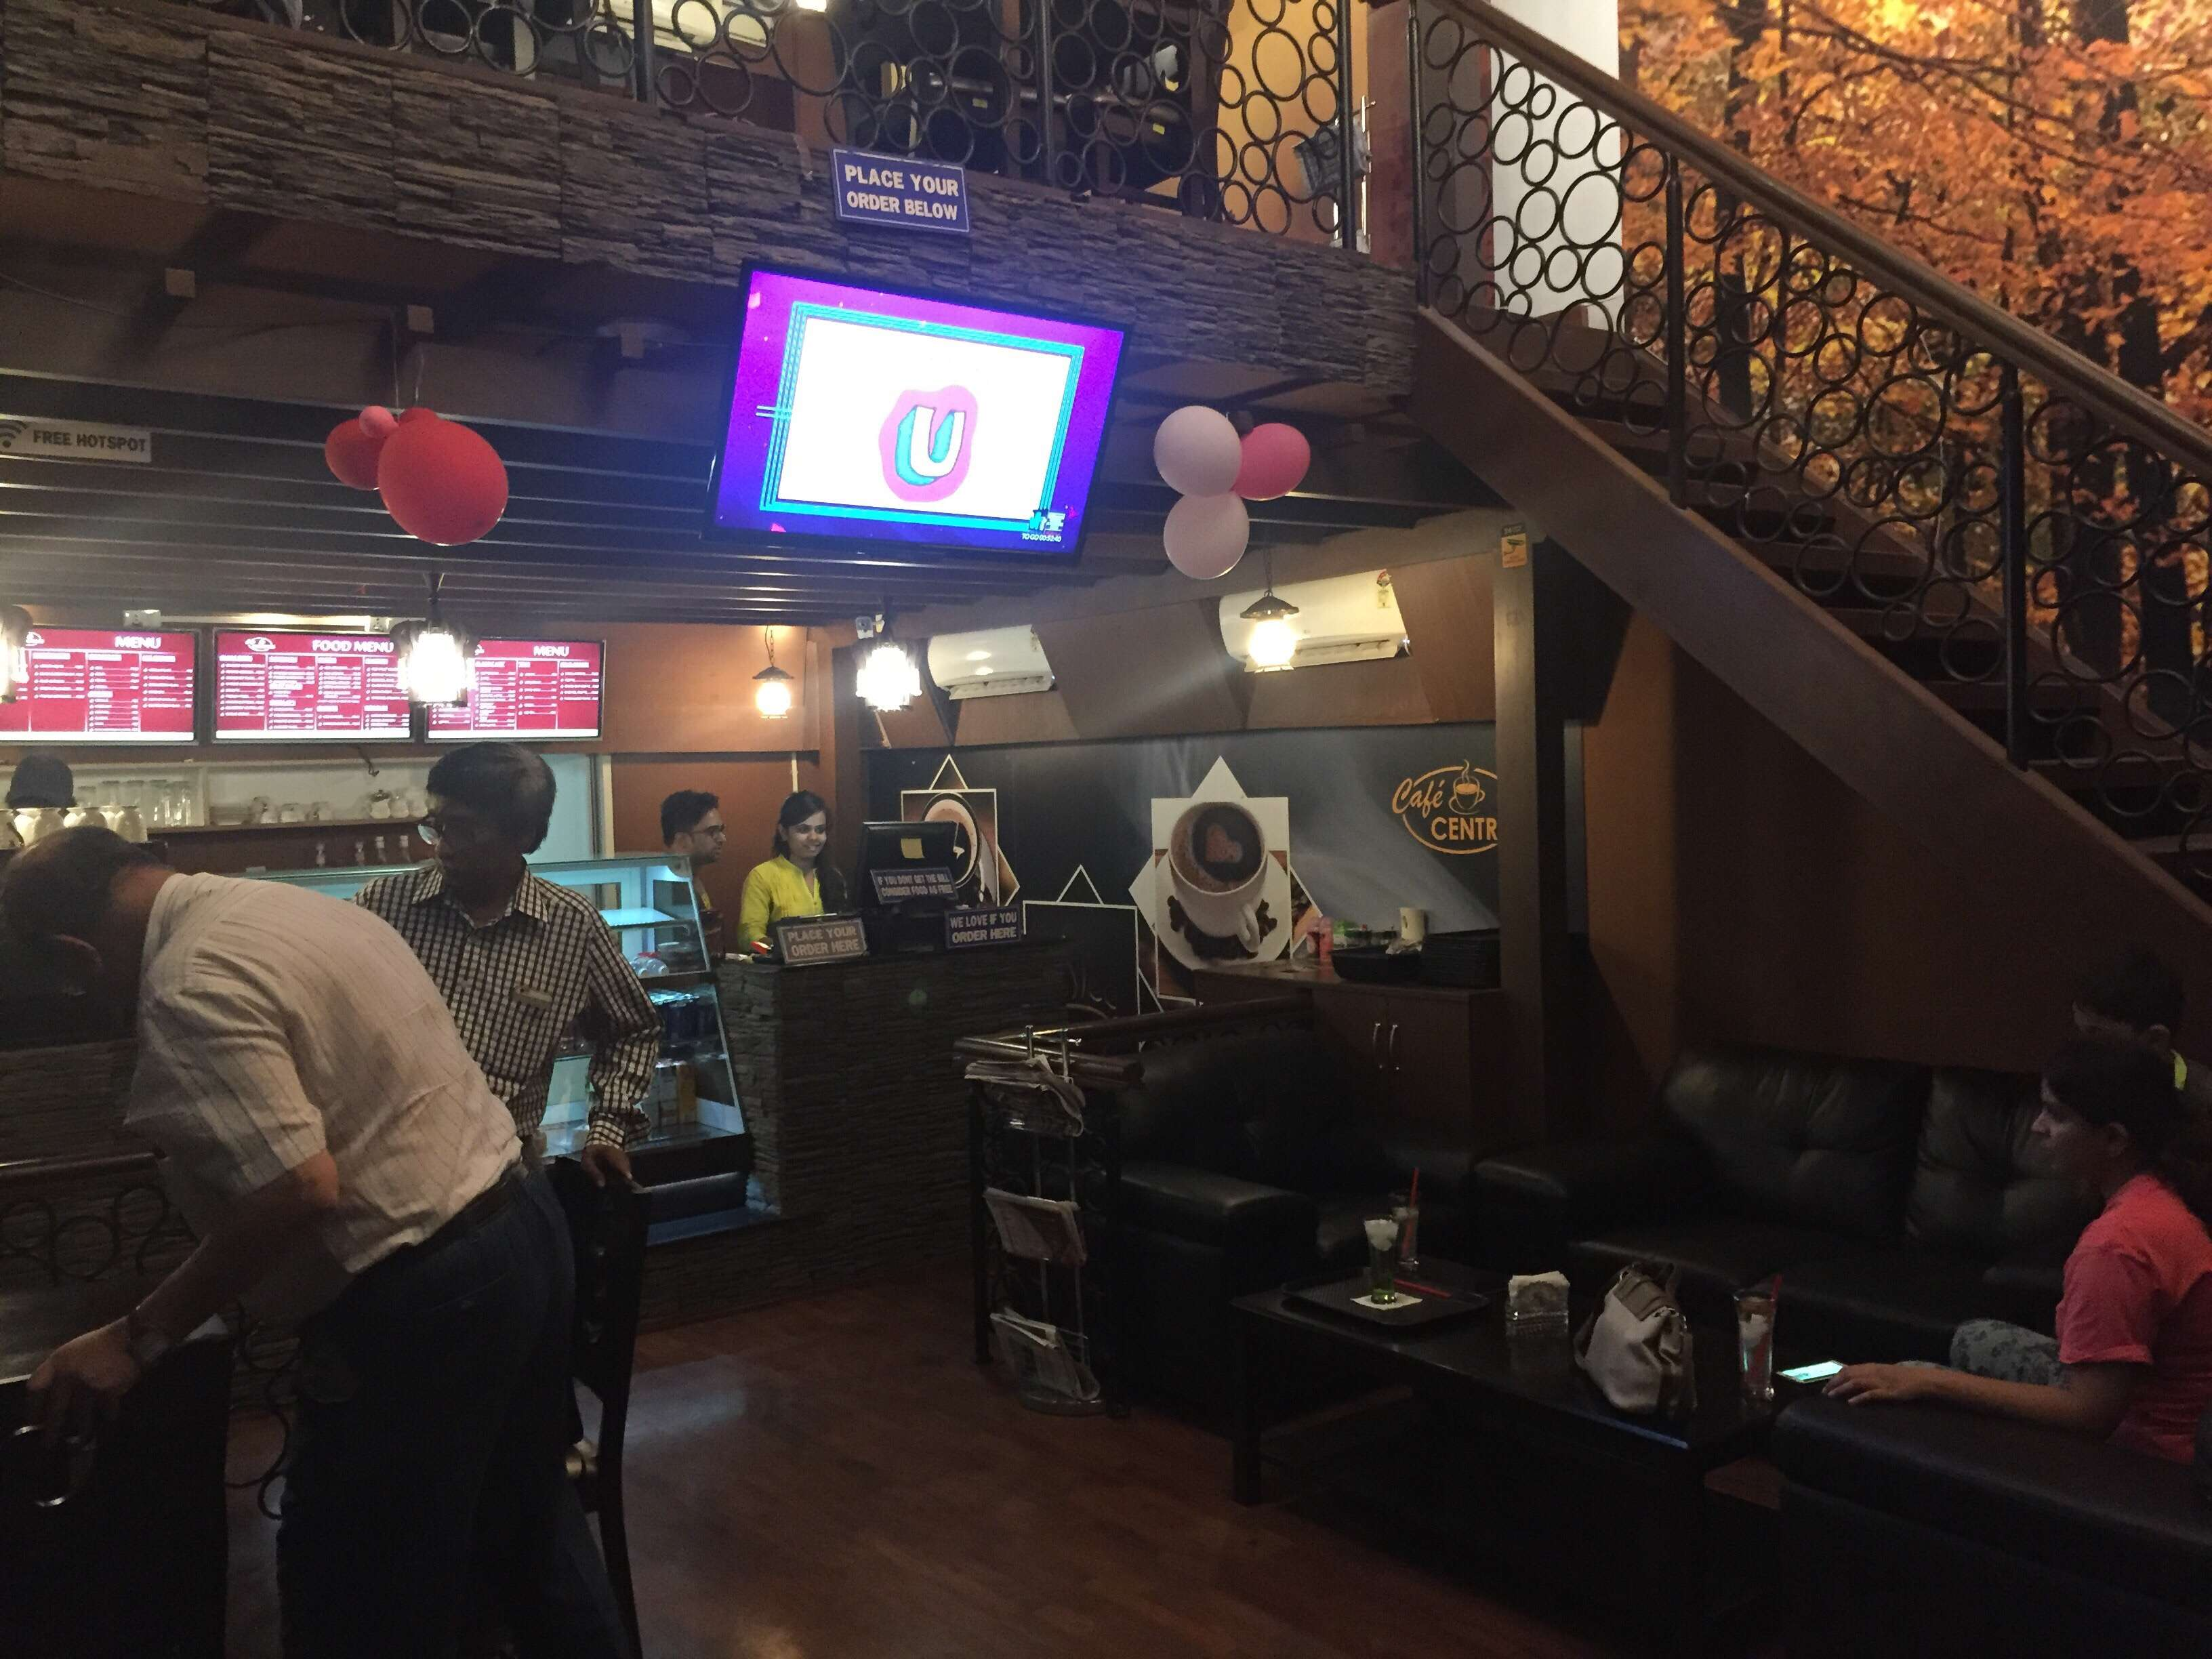 Cafe Centralis Restaurant, Bangalore